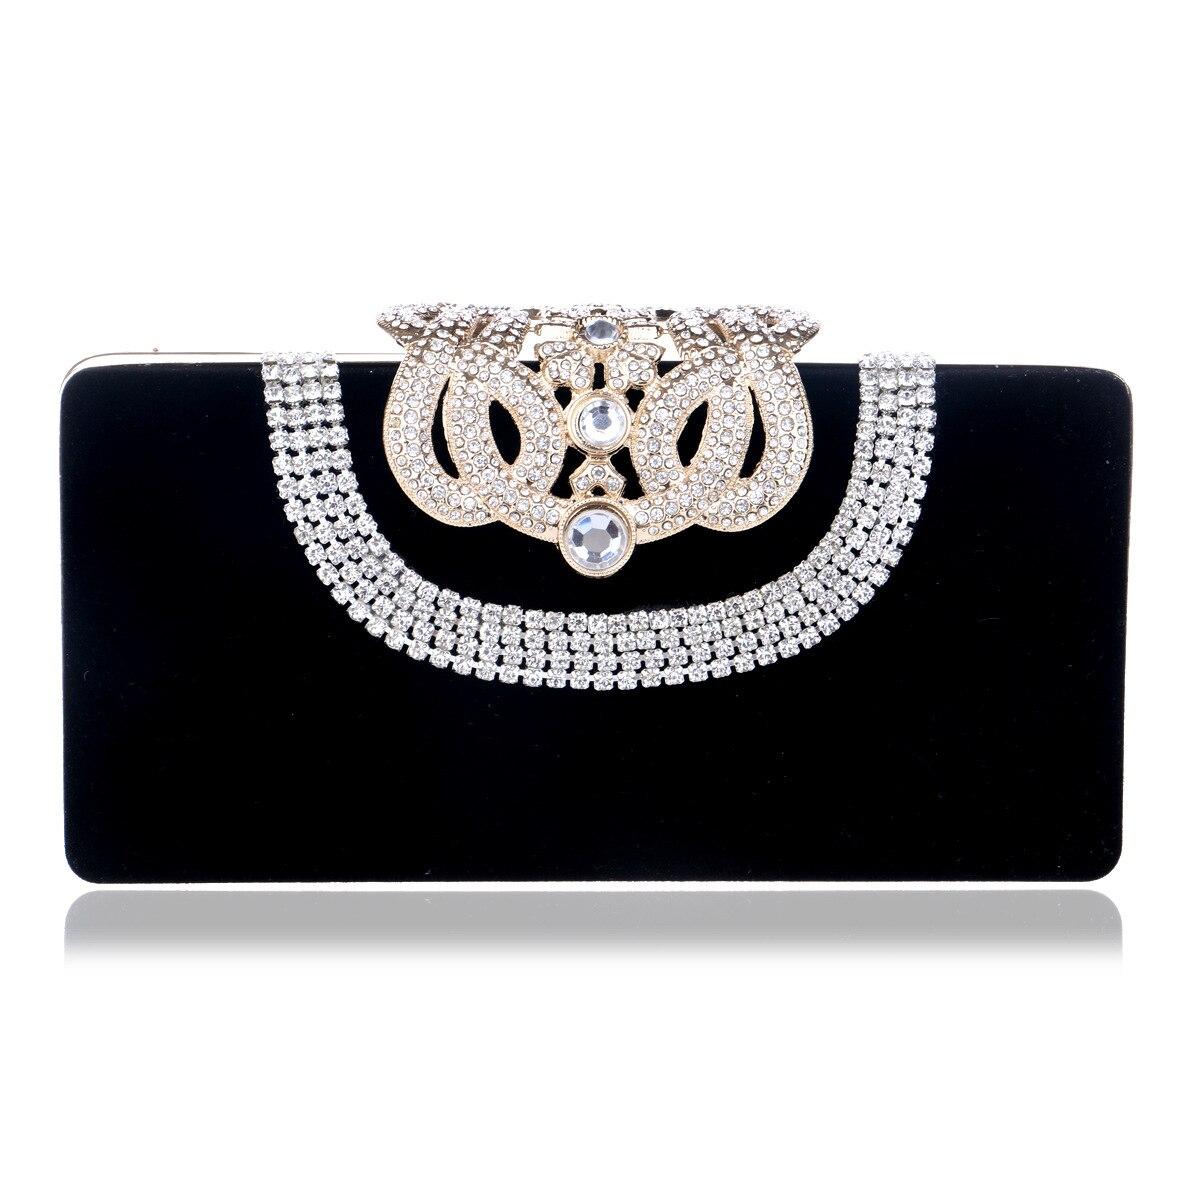 Purse Rhinestones Clutch Shoulder-Bag Evening-Bags Mini Diamonds for Lady YM1034 Crown